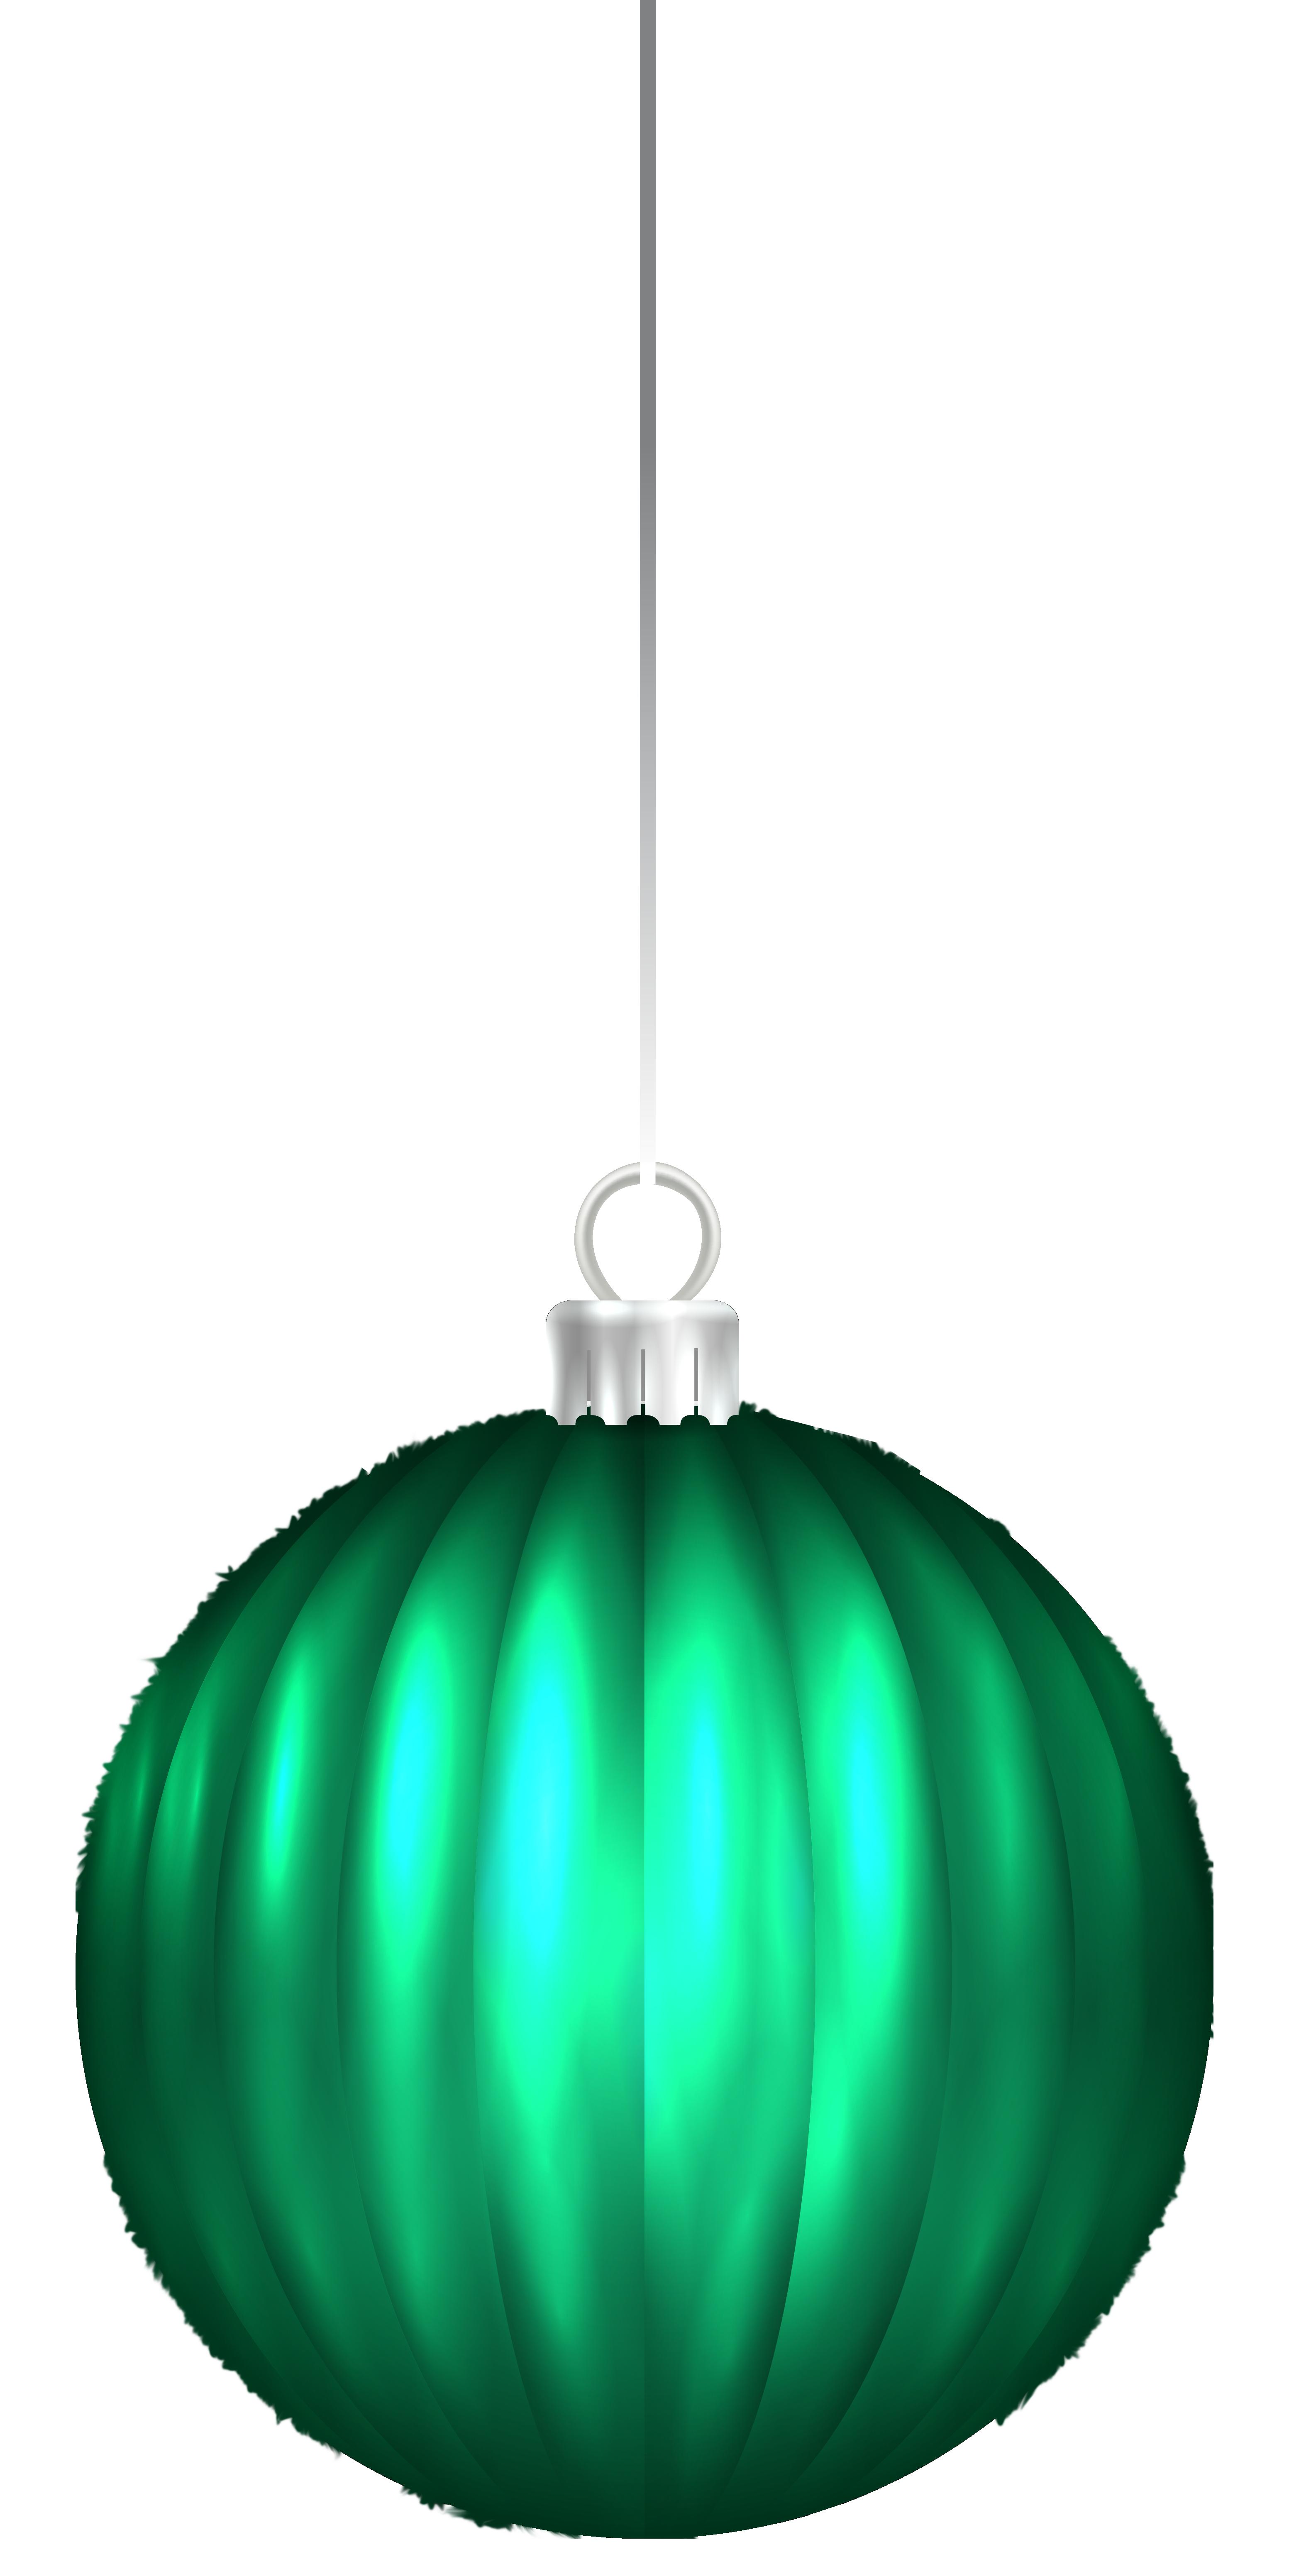 3106x6208 Green Christmas Ball Ornament Png Clip Art Imageu200b Gallery